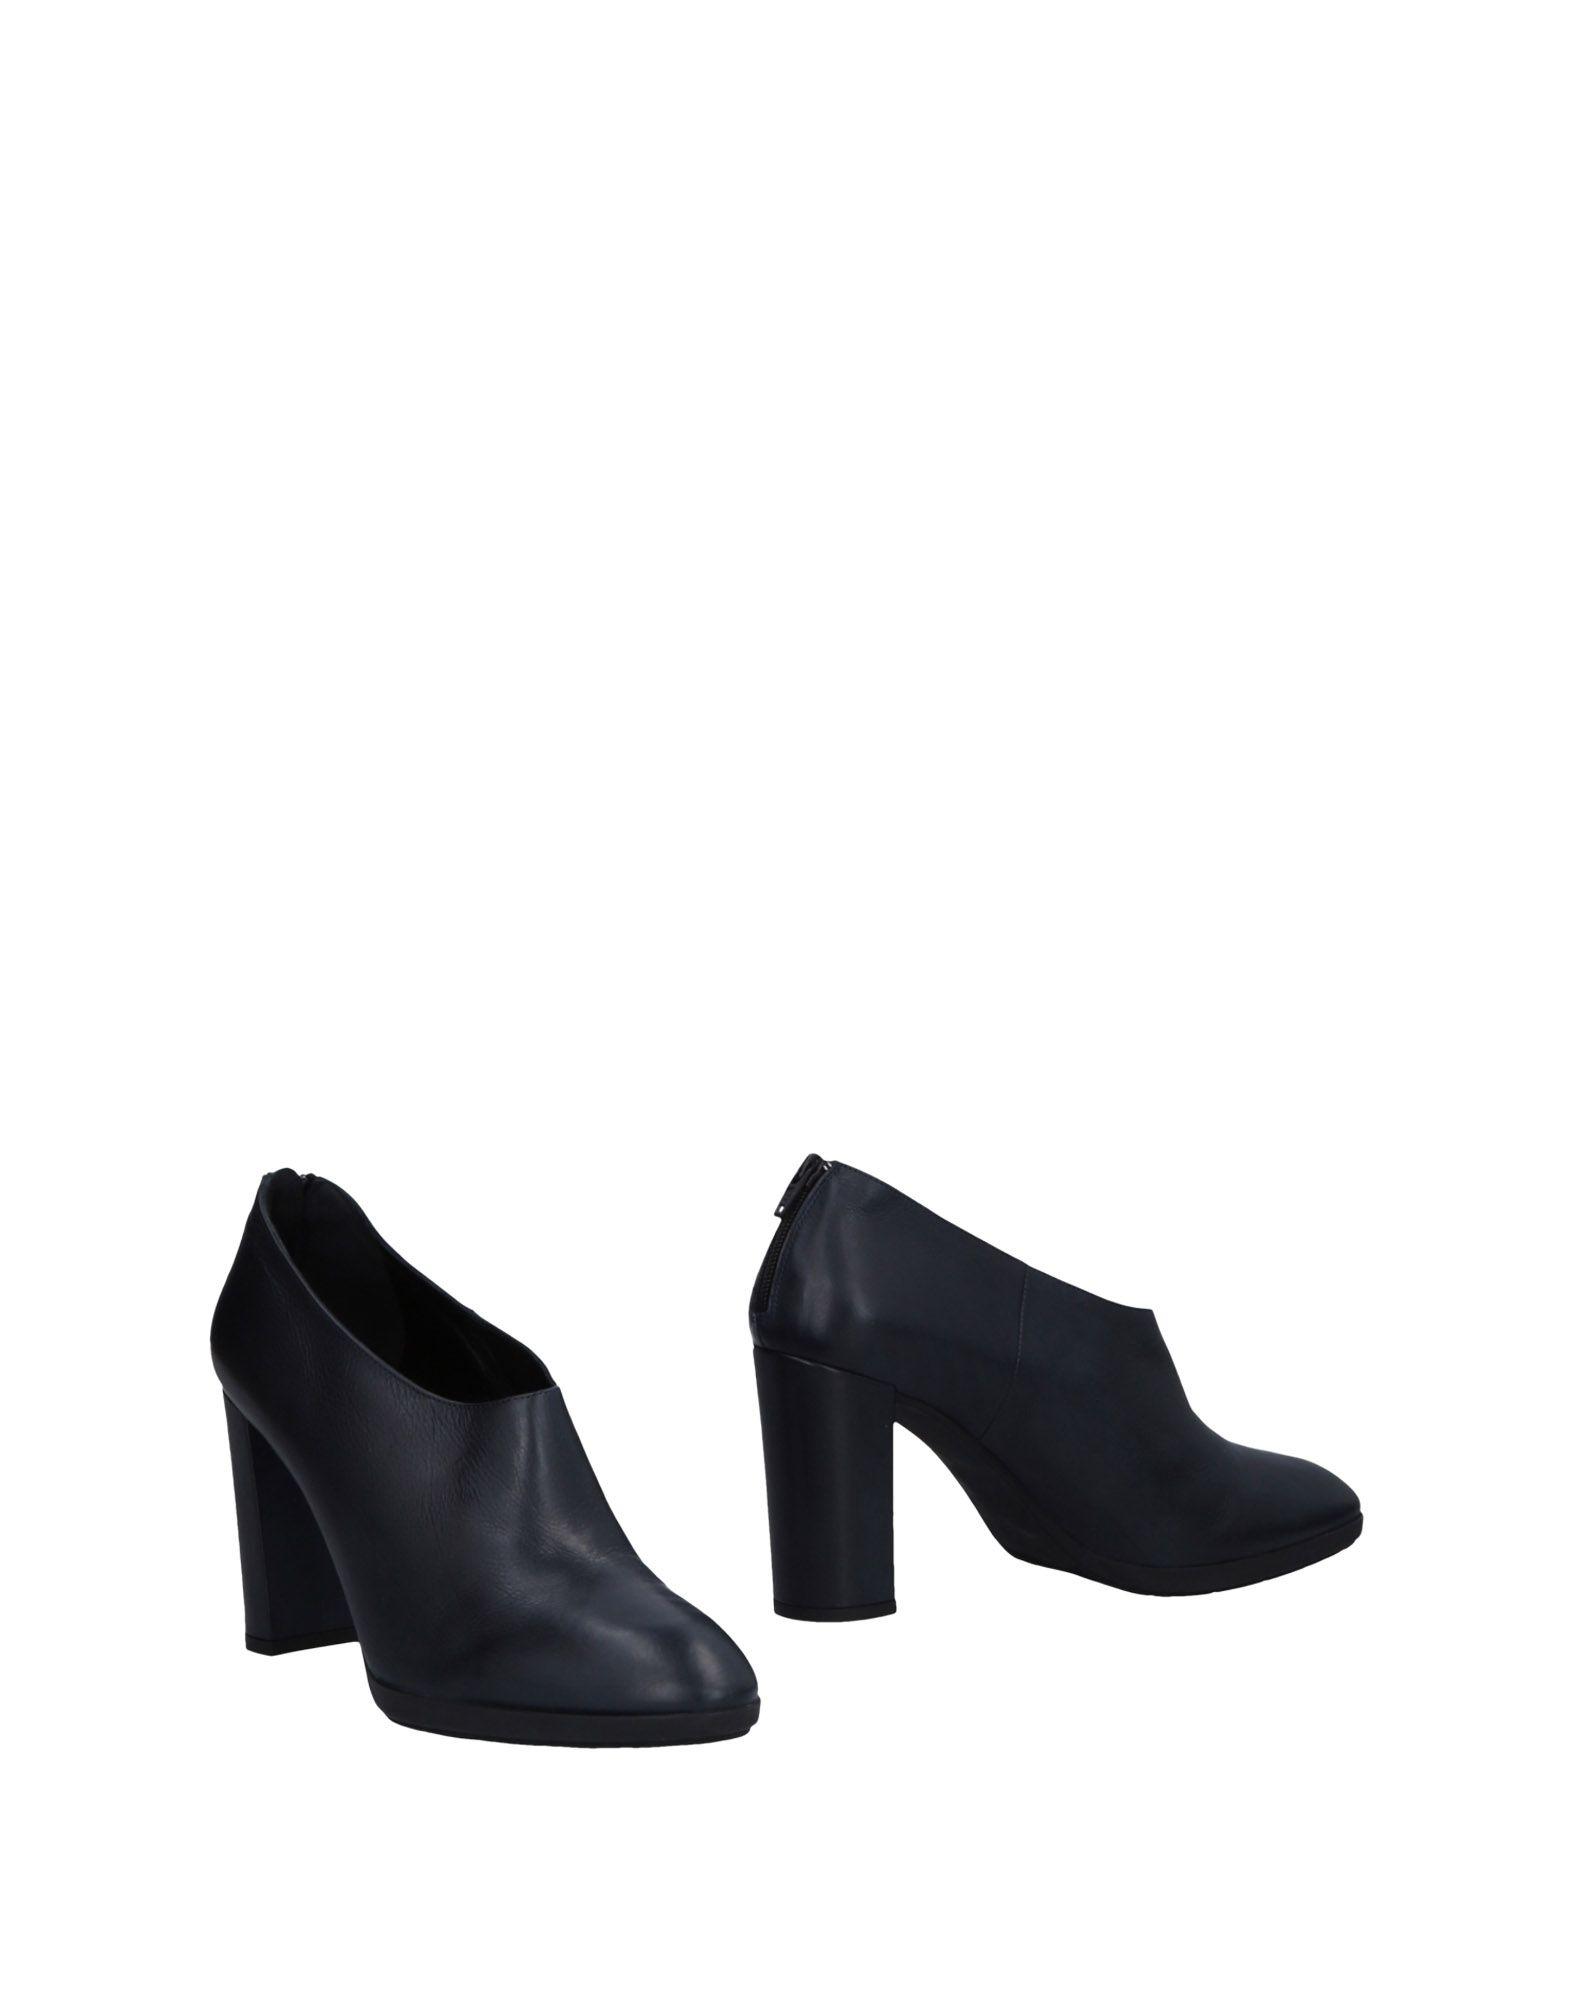 Guglielmo Rotta Ankle Boot Ankle - Women Guglielmo Rotta Ankle Boot Boots online on  Australia - 11474639EG caabf7